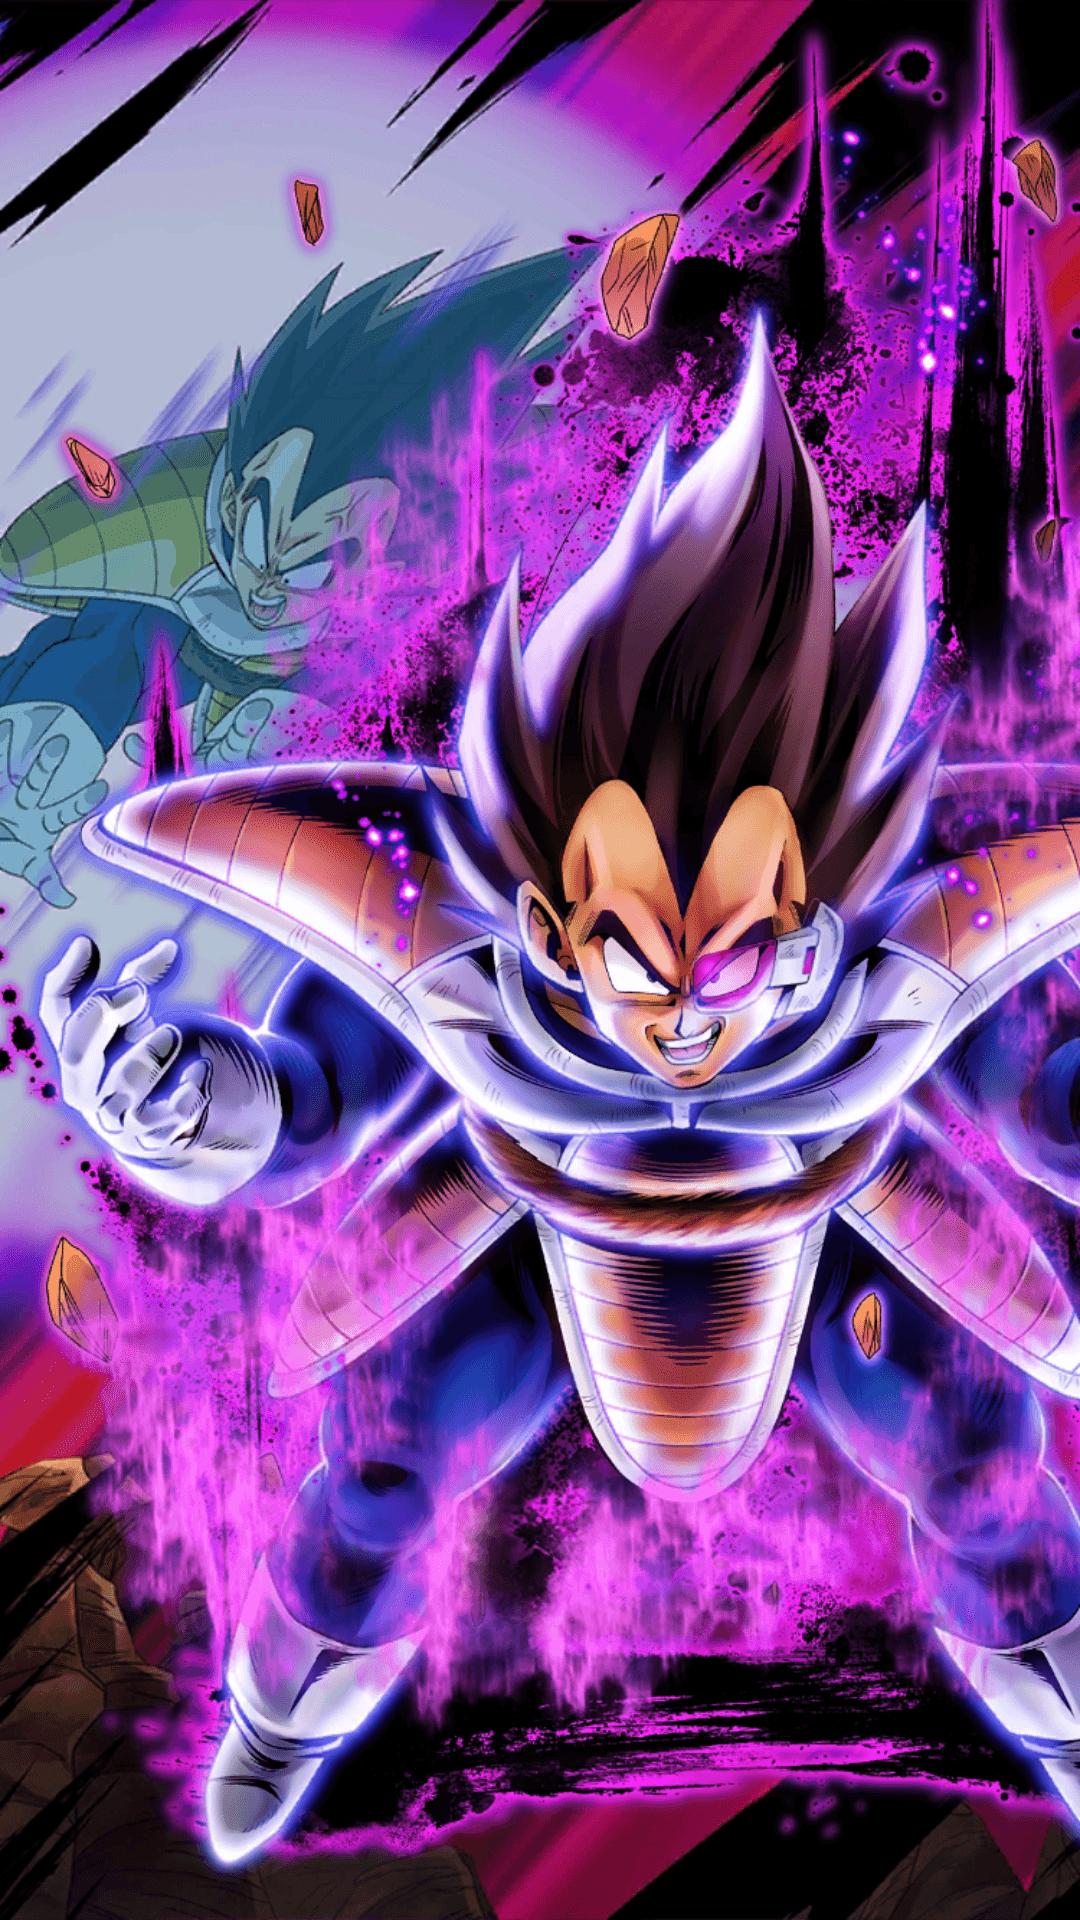 Vegeta Dragon Ball Legends 315497 Hd Wallpaper Backgrounds Download